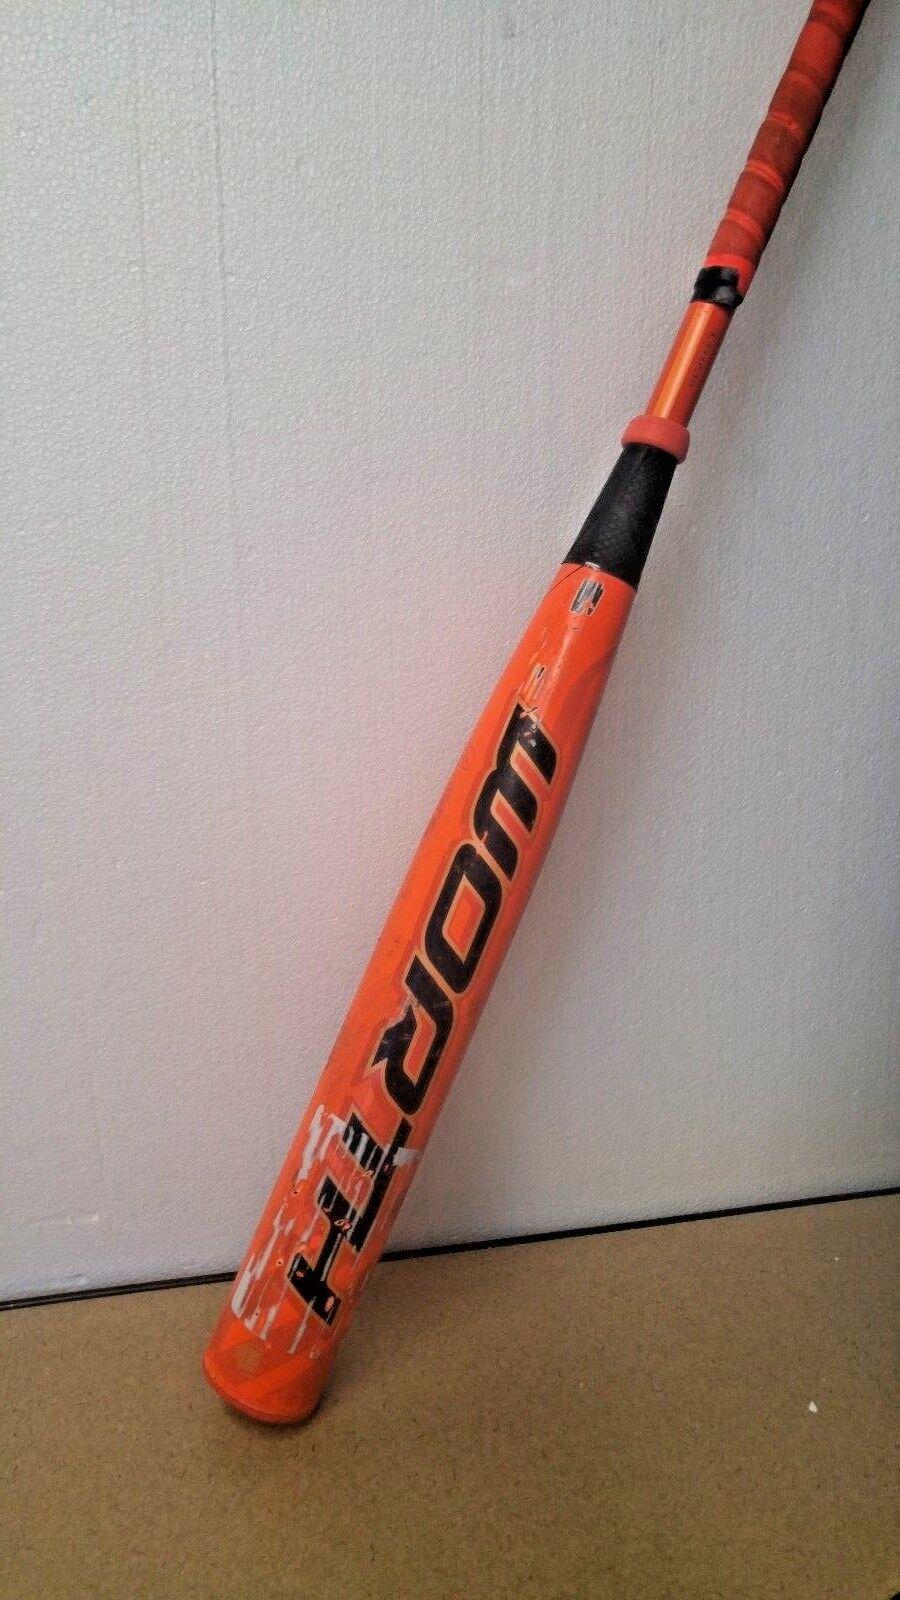 Worth 2 Legit Composite Fastpitch Softball Bat